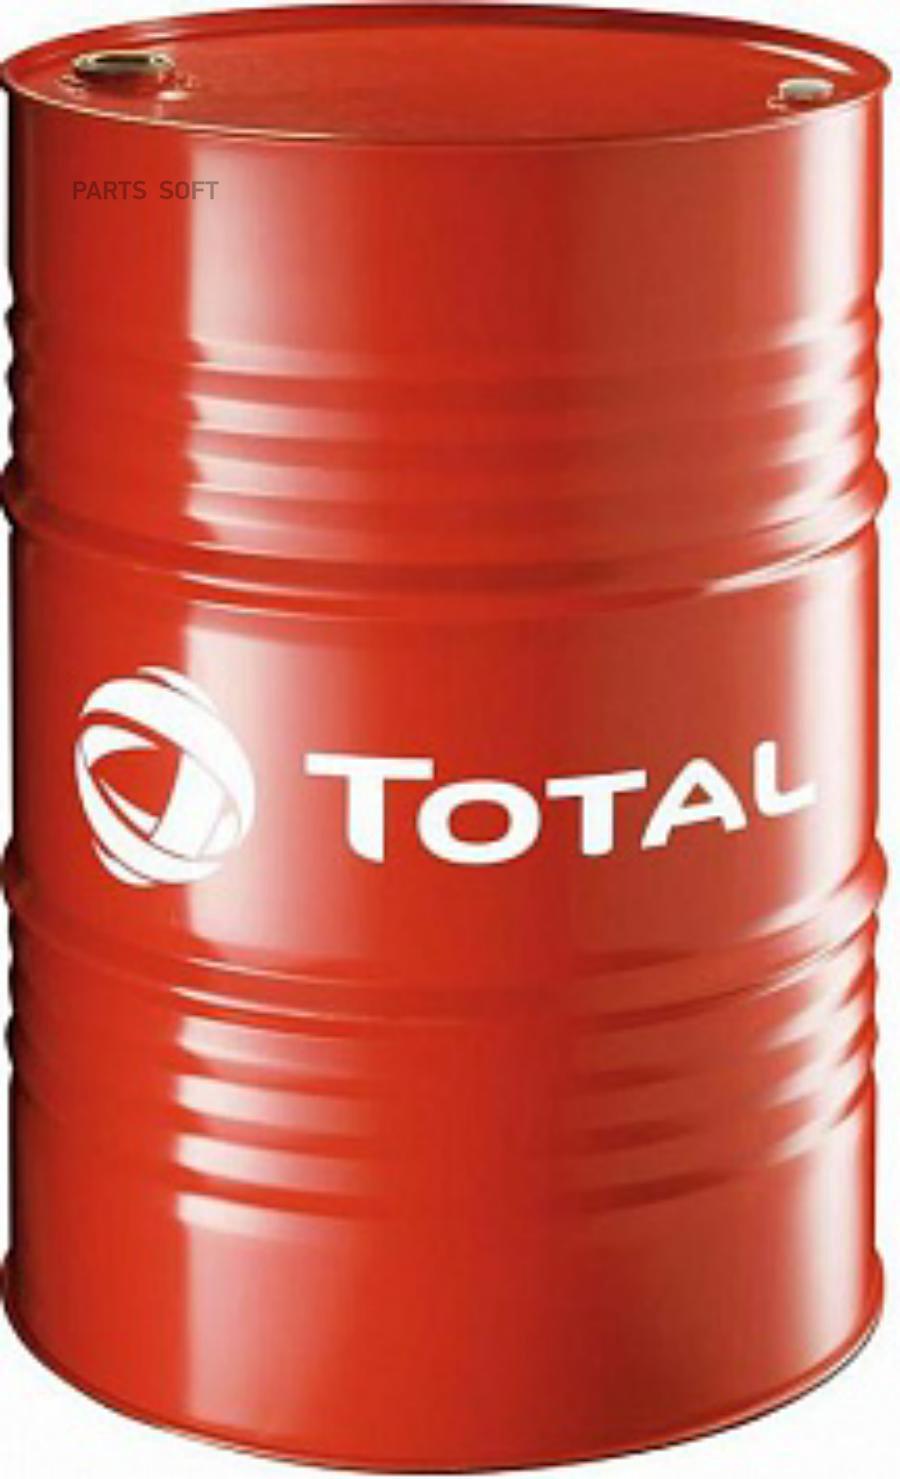 TOTAL Transmission Gear 9 FE 75W-90